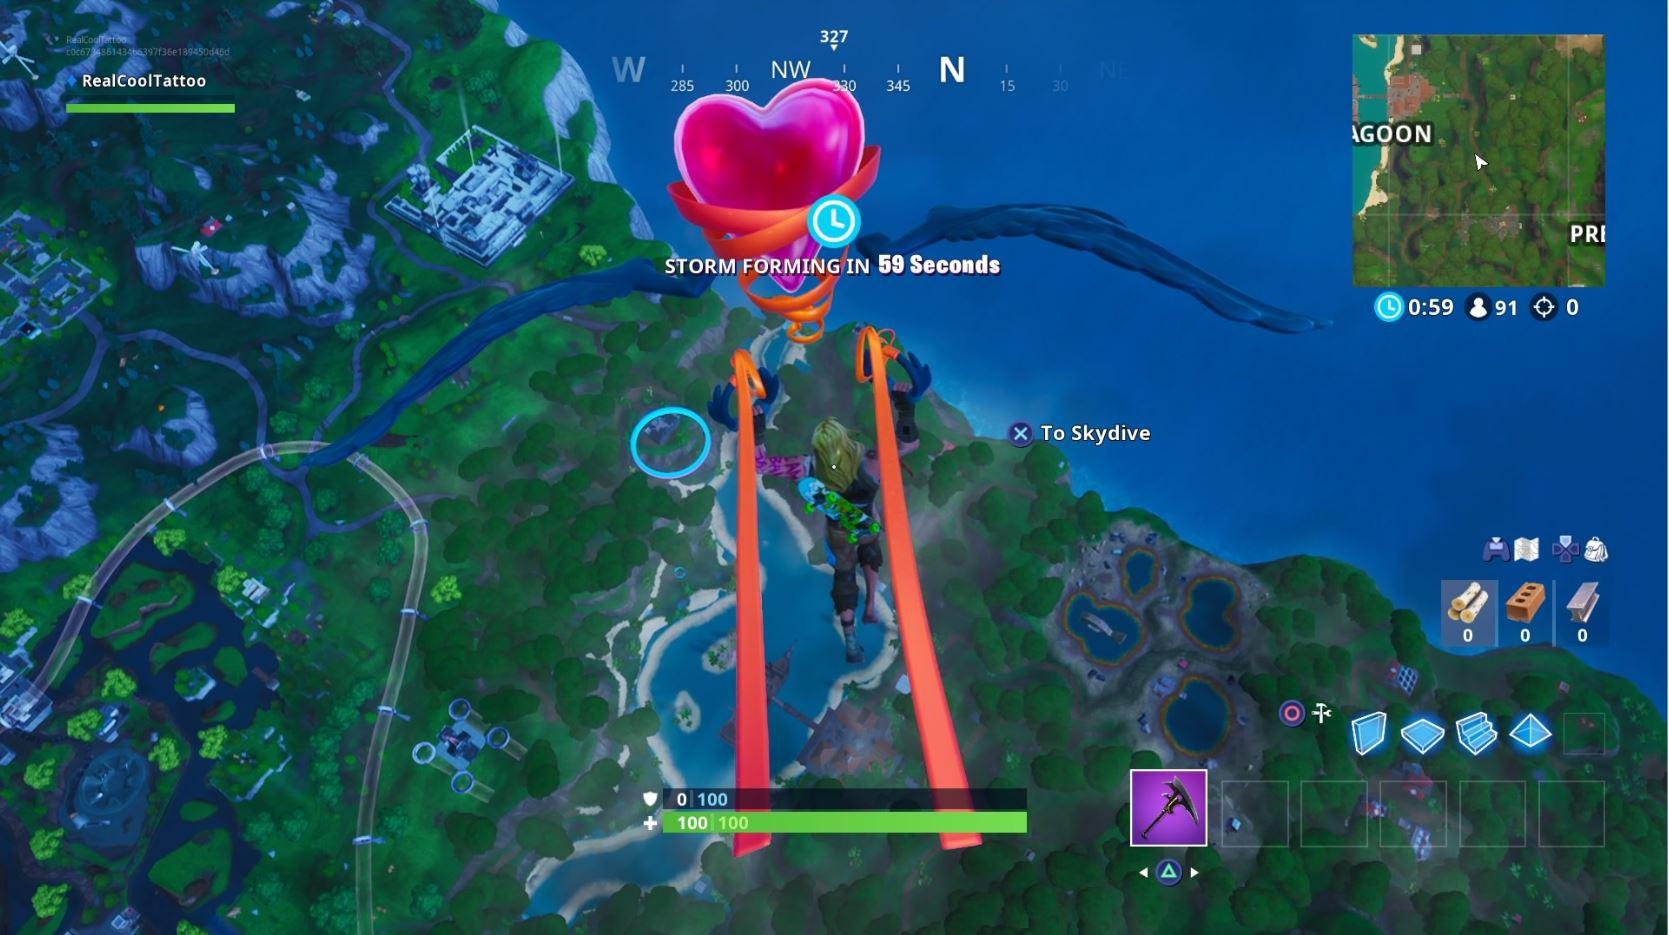 Fortnite: Guía de ubicación de Fortbyte - Cada desafío en un solo lugar 3